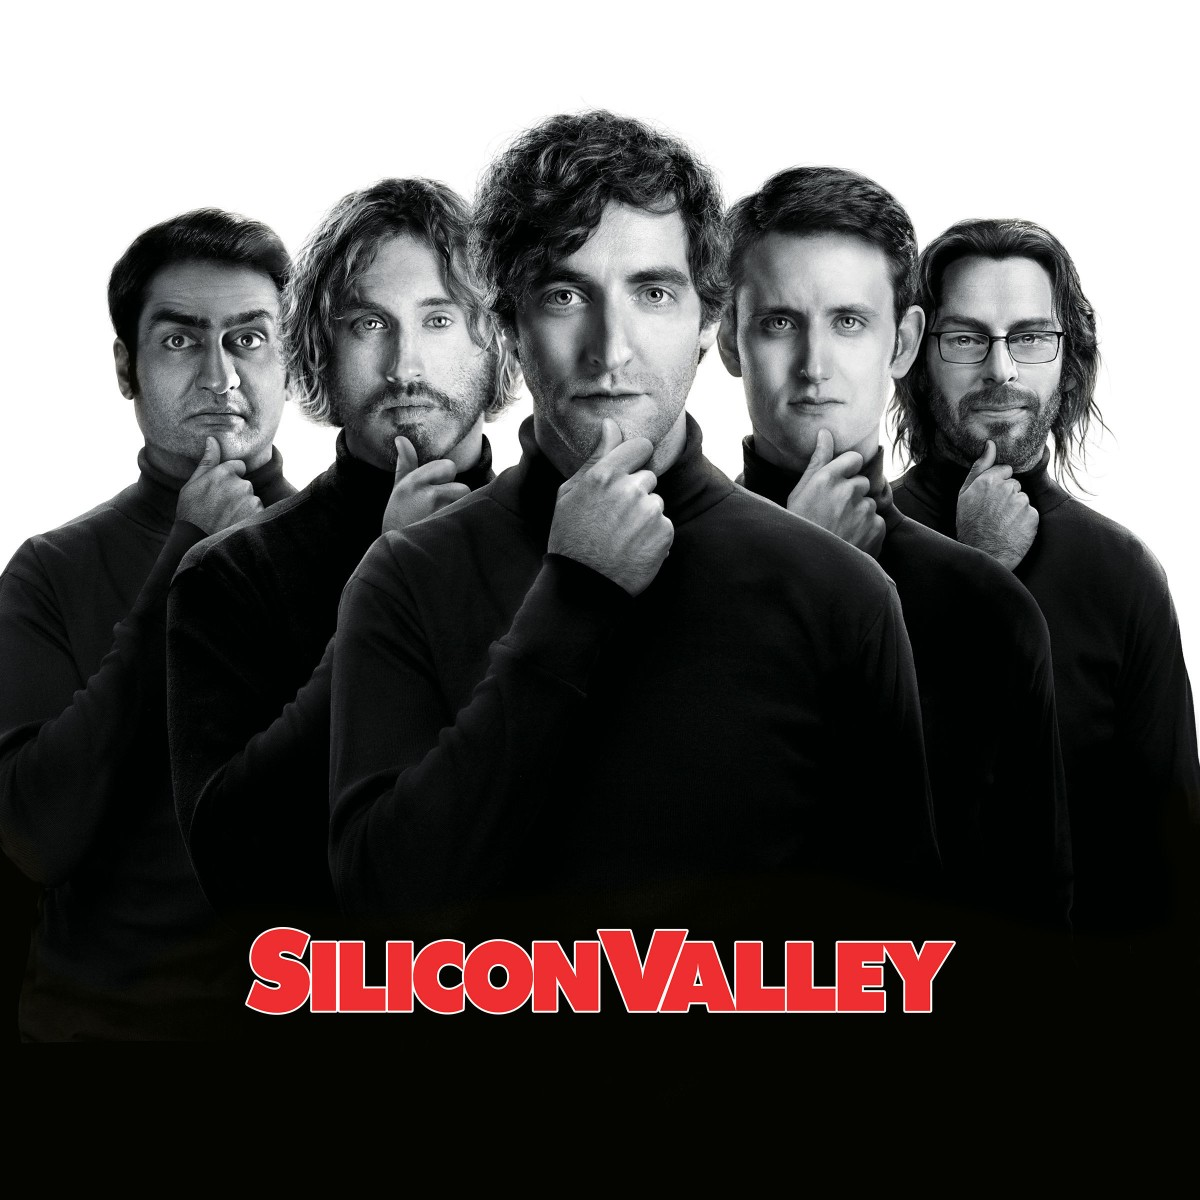 Silicon-Valley-Season-1-Artwork-1200x1200.jpg